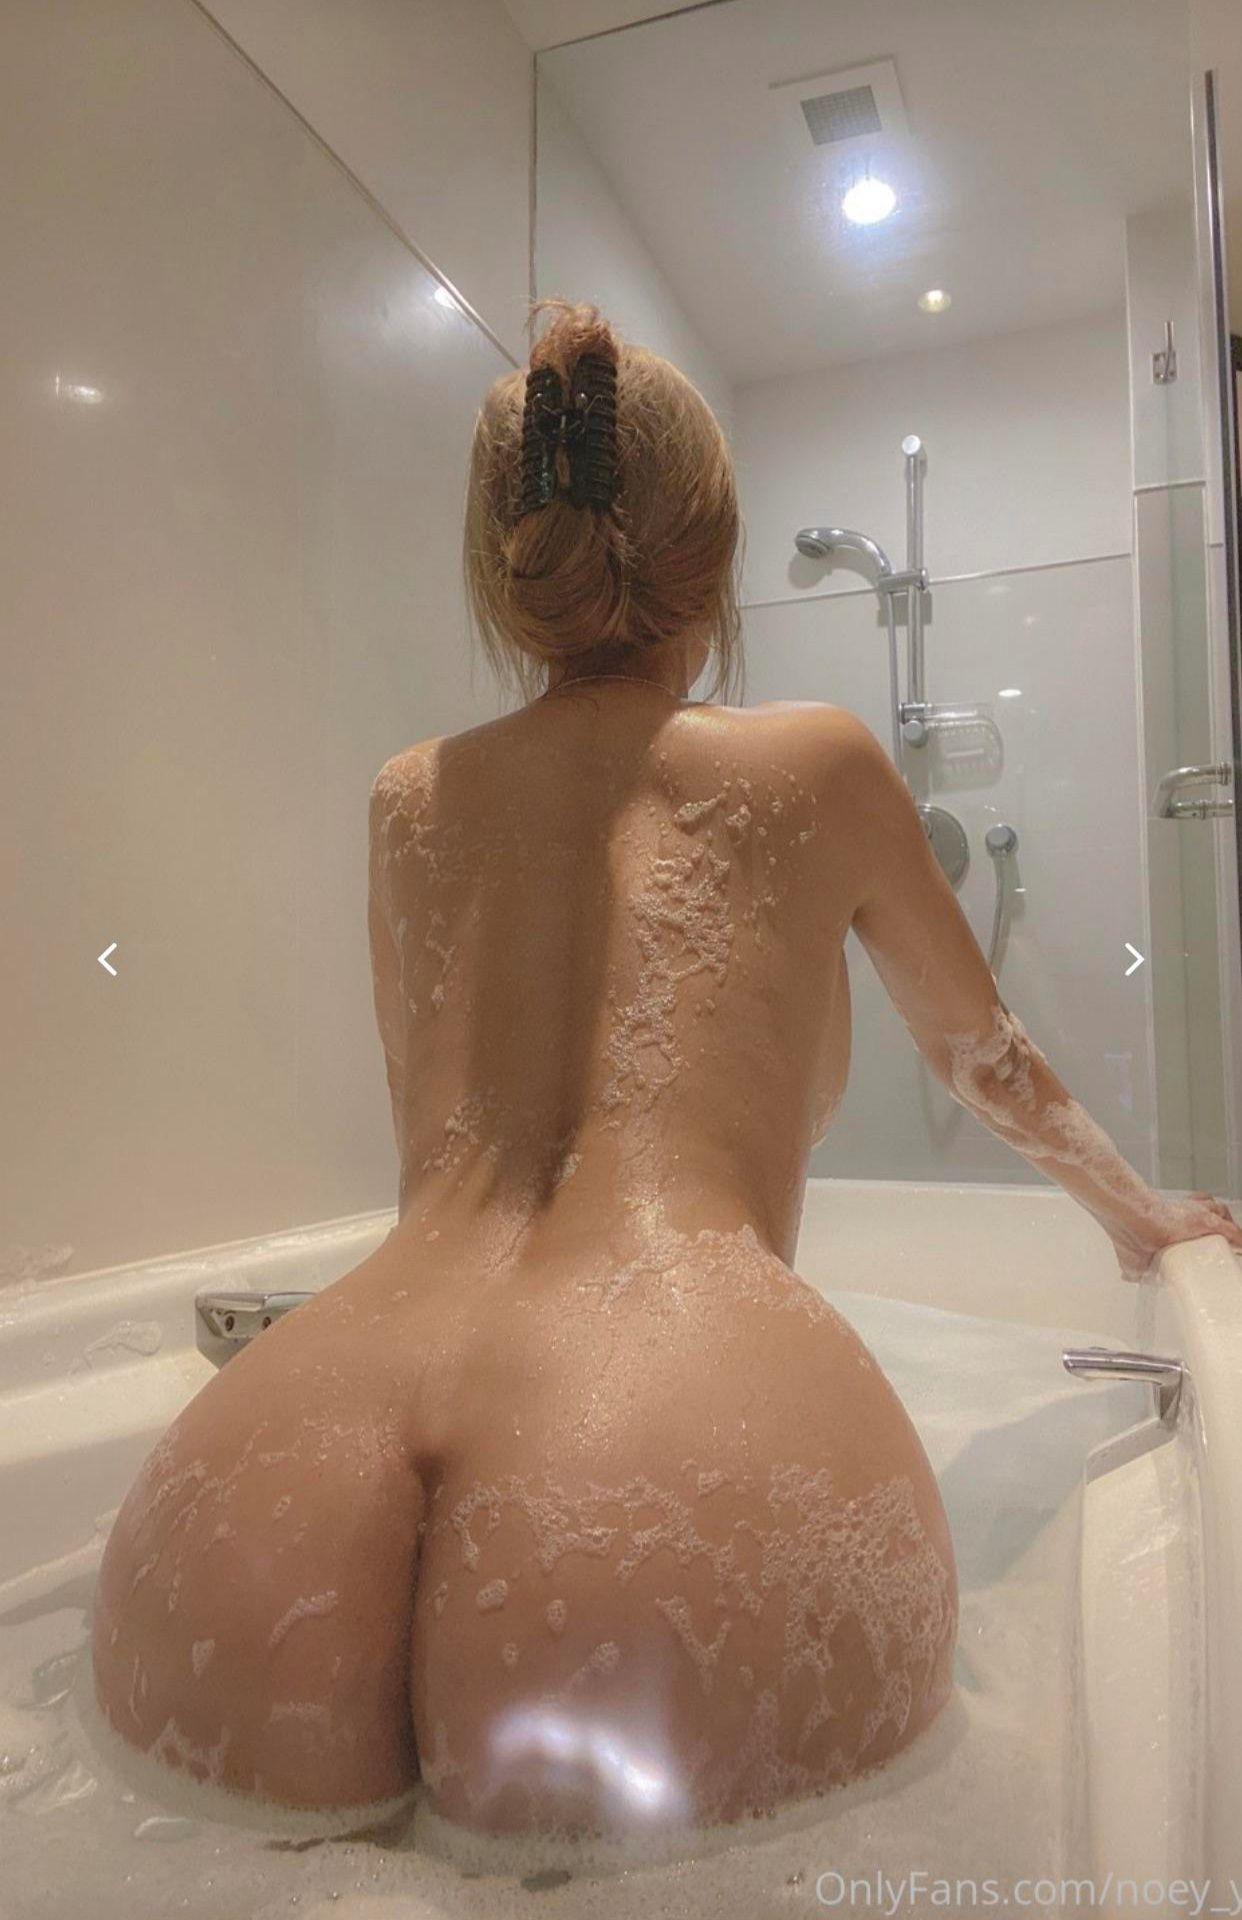 Noey Yanis Naked Pics